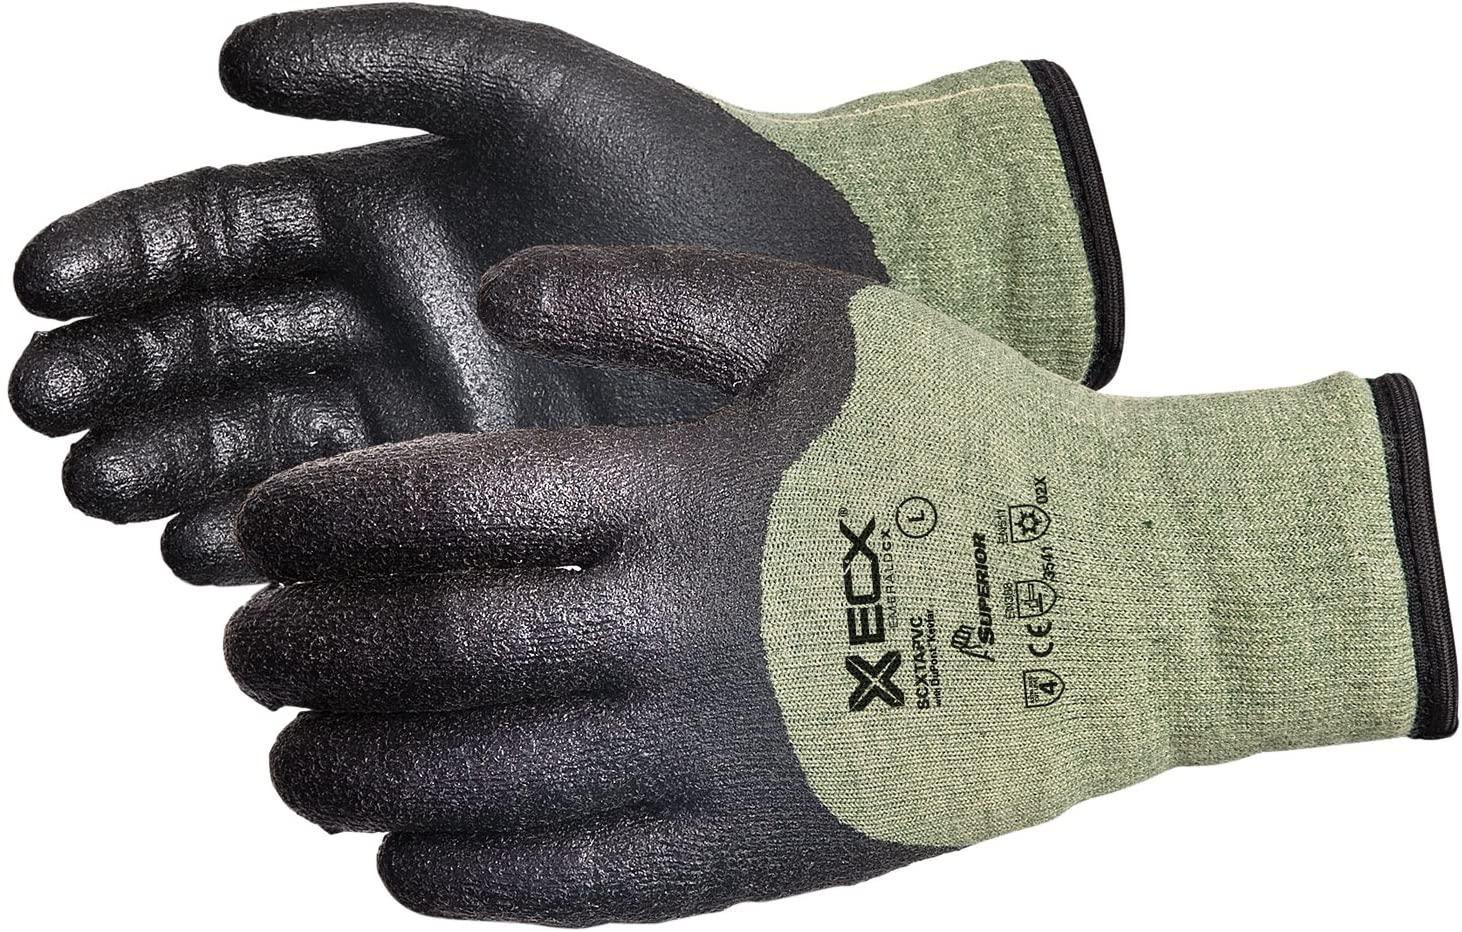 SCXTAPVC/X Emerald CX Cut-Resistant Kevlar/Steel Winter Glove with PVC Palm, Size Extra Large